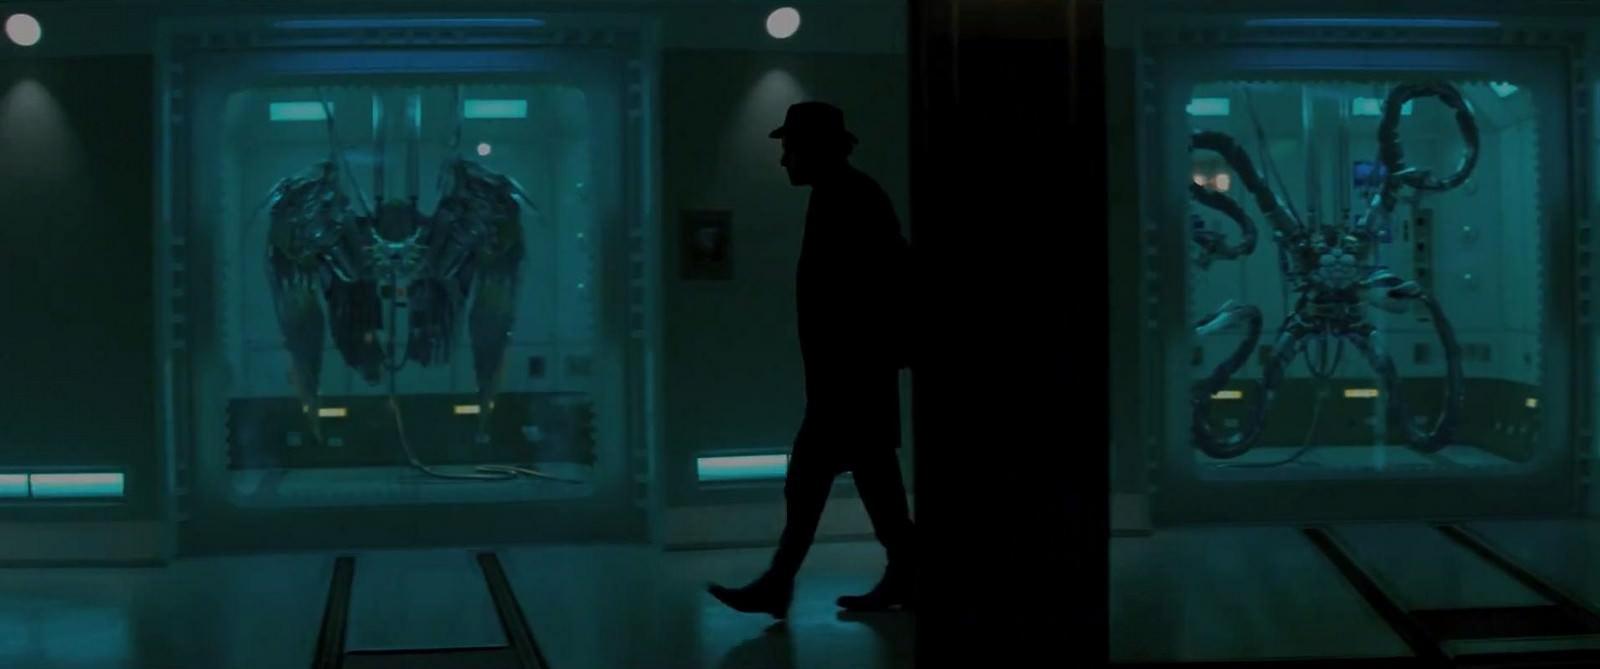 Movie, The Amazing Spider-Man 2(美國, 2014年) / 蜘蛛人驚奇再起2:電光之戰(台灣) / 超凡蜘蛛侠2(中國) / 蜘蛛俠2:決戰電魔(香港), 電影彩蛋